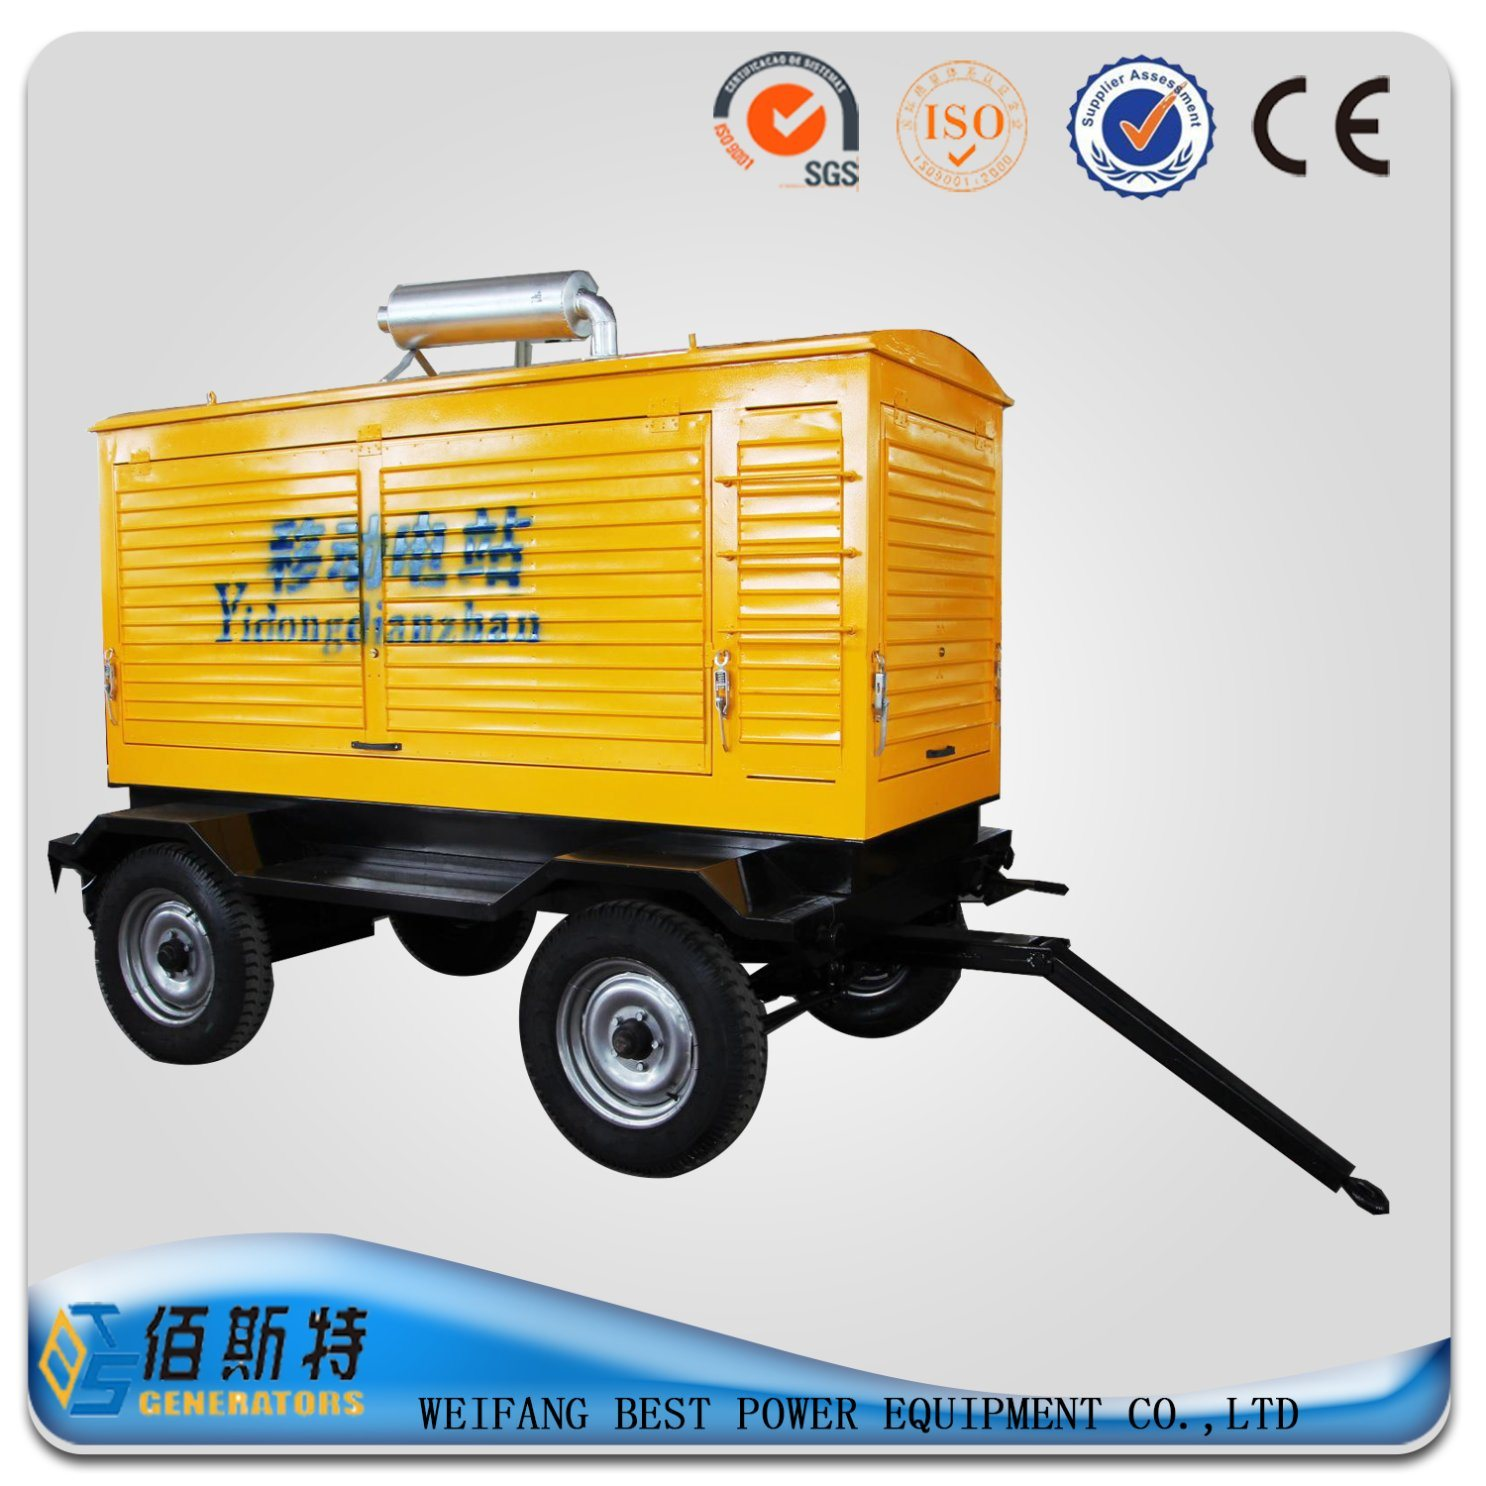 China Mobile Diesel Generator 50kVA Trailer Power Plant China